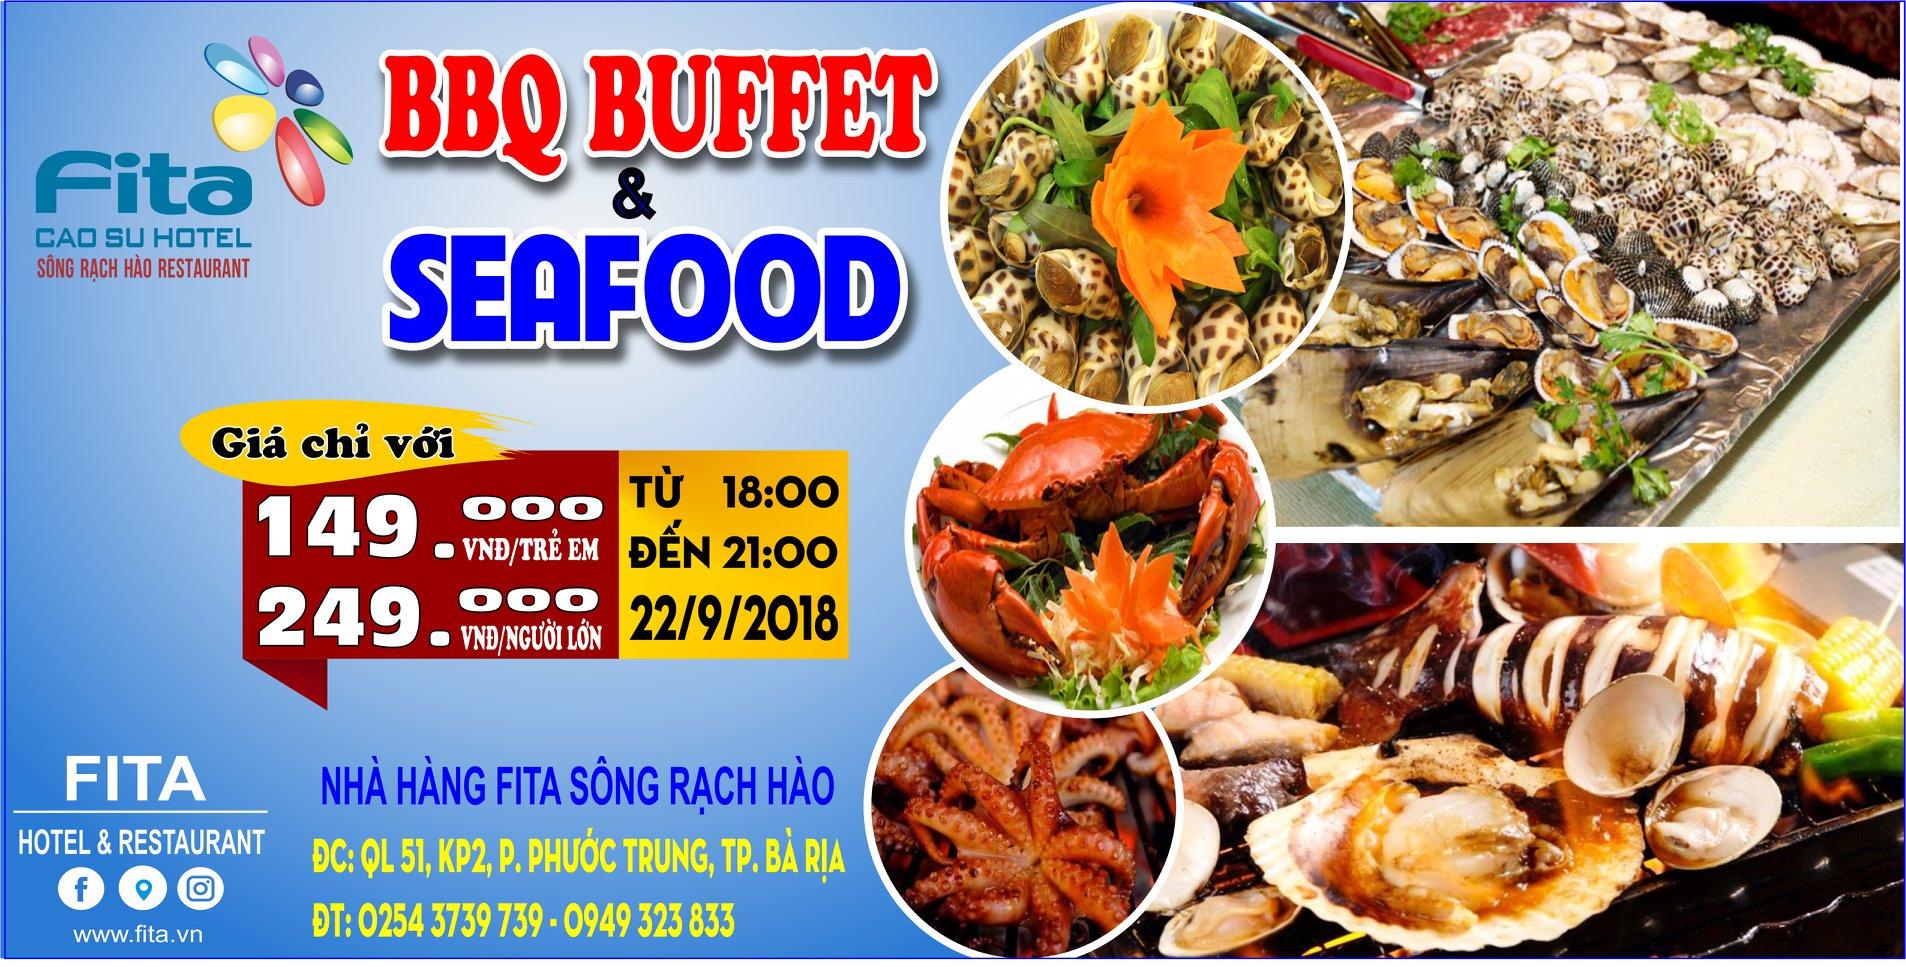 BBQ Buffet Hải sản